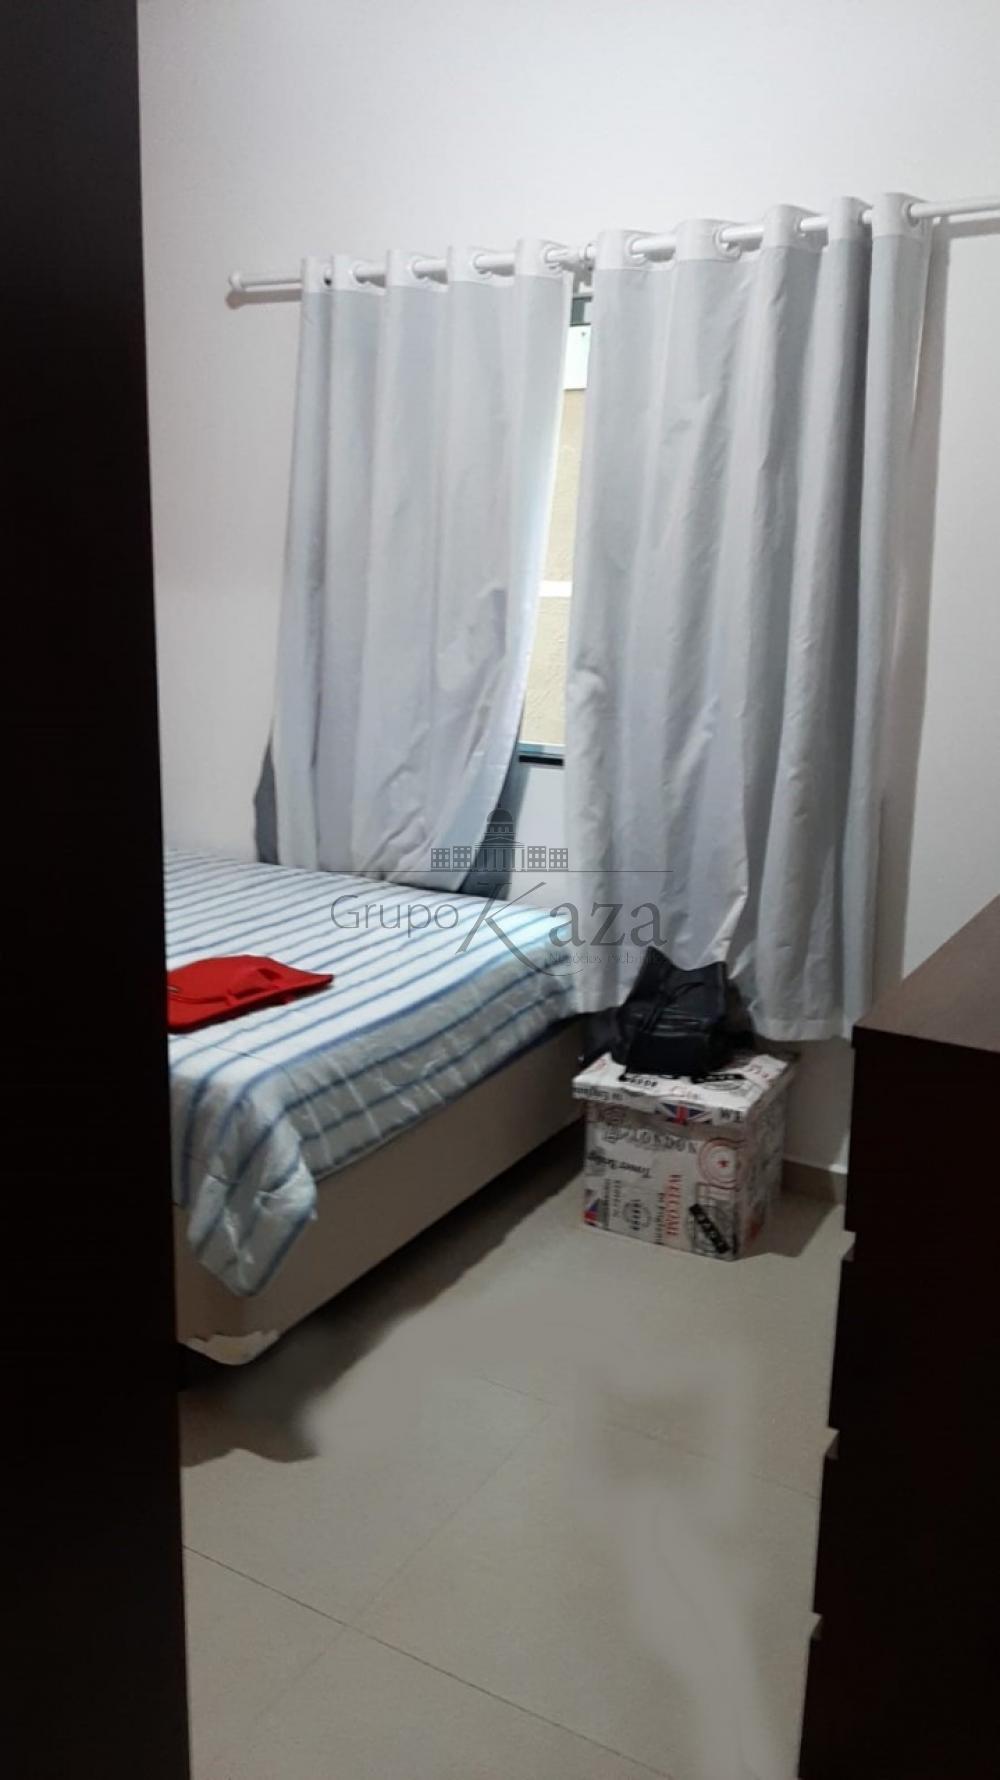 alt='Comprar Casa / Térrea em Caraguatatuba R$ 590.000,00 - Foto 9' title='Comprar Casa / Térrea em Caraguatatuba R$ 590.000,00 - Foto 9'